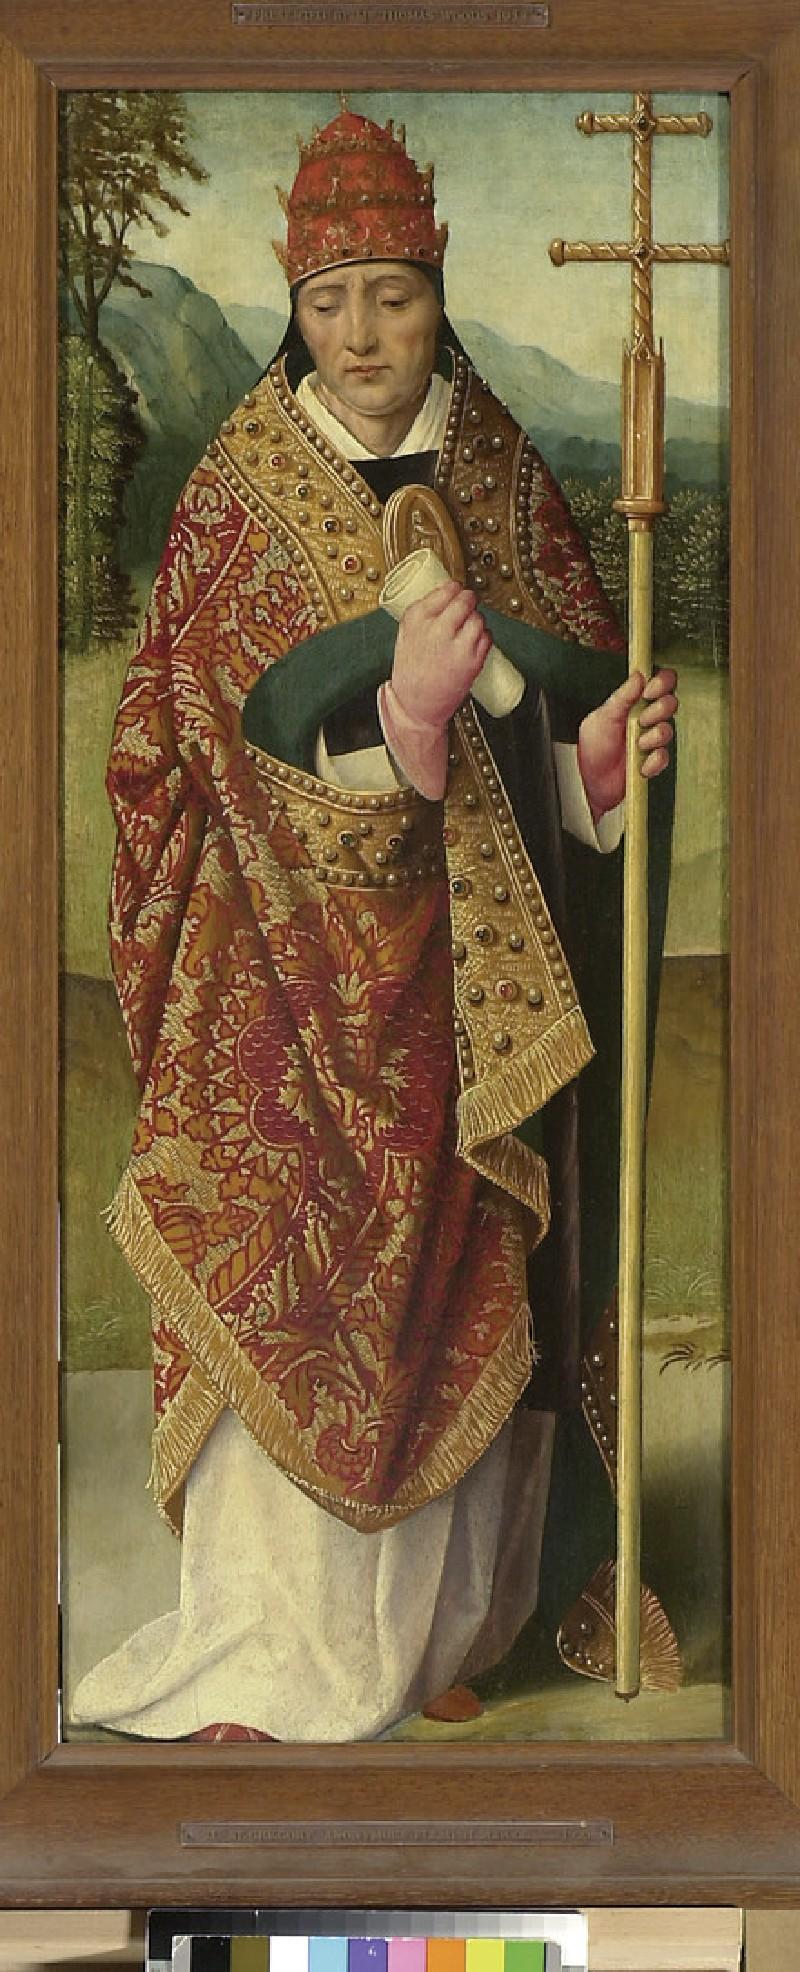 A papal Saint